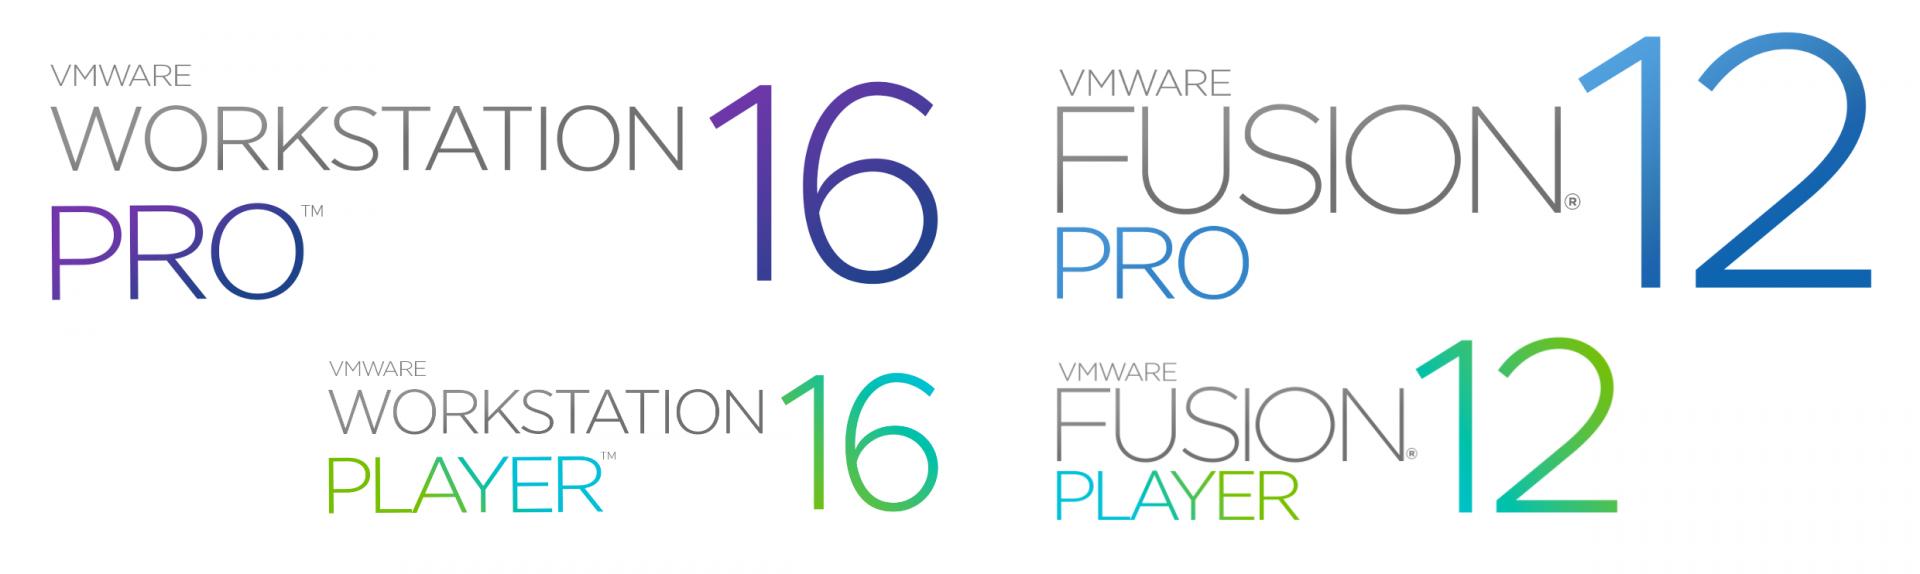 VMware Workstation 16 & Fusion 12 Announced ...